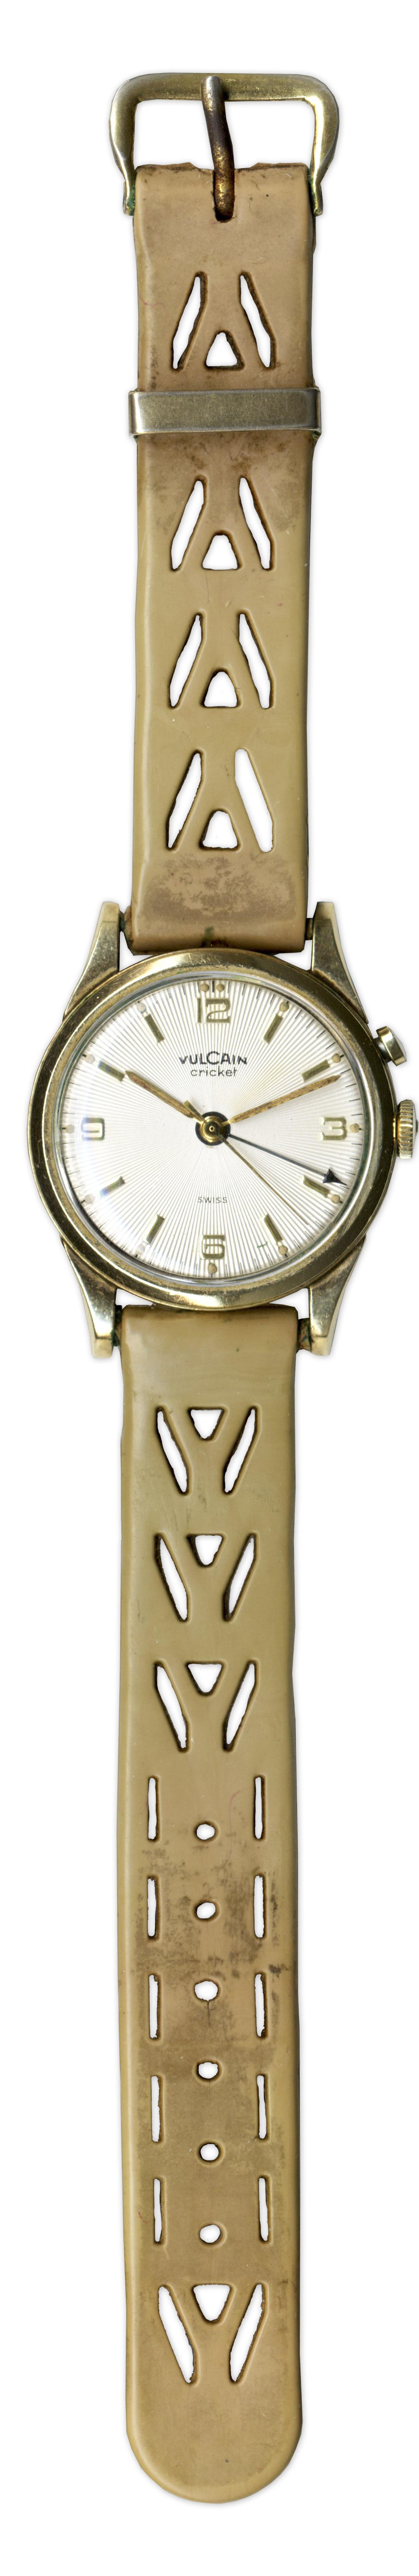 Harry Truman Memorabilia Vulcain Cricket Watch From the Estate of President Harry S. Truman